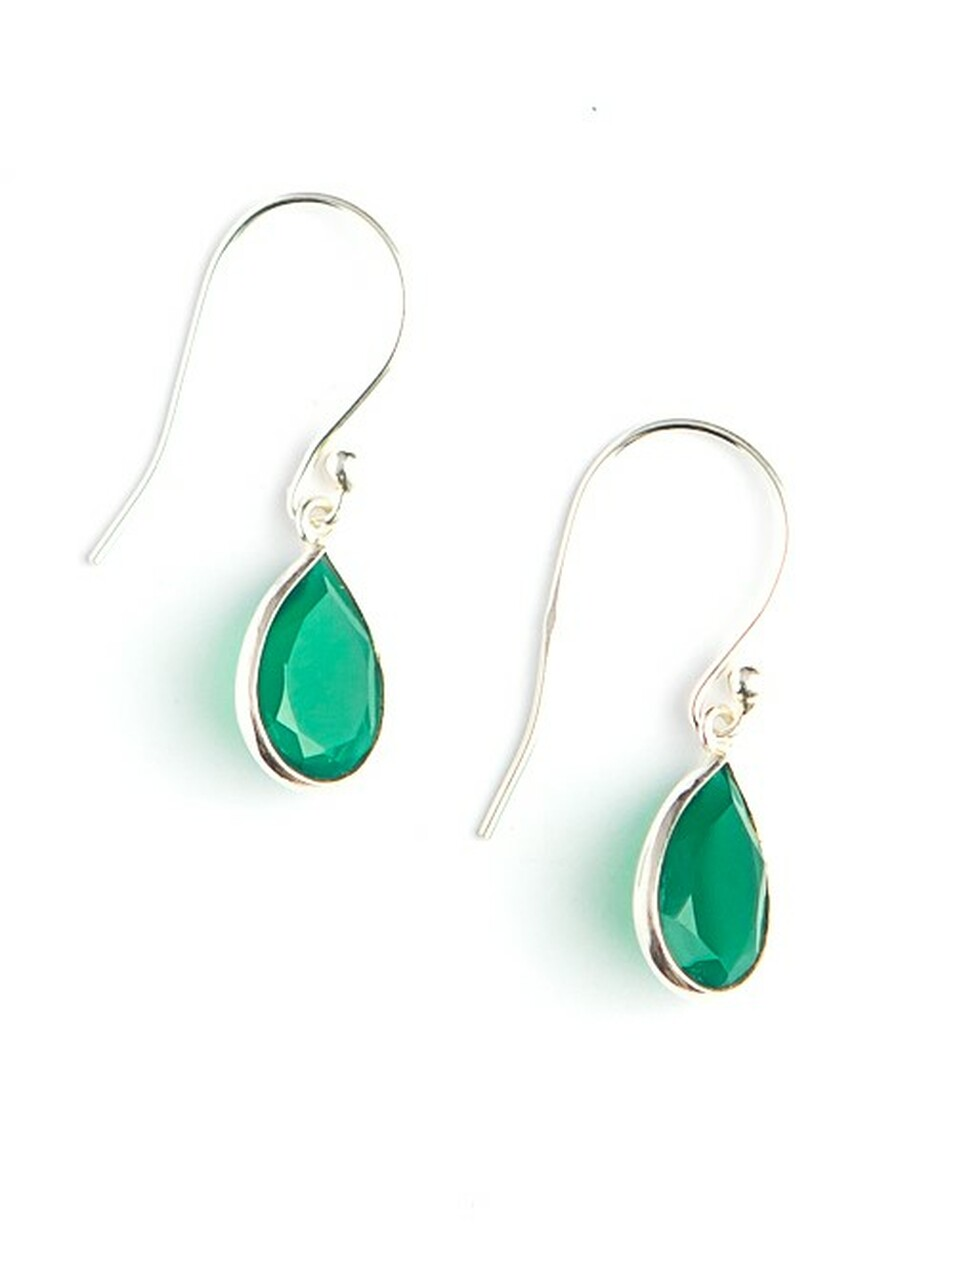 Earrings - Green quartz stone: